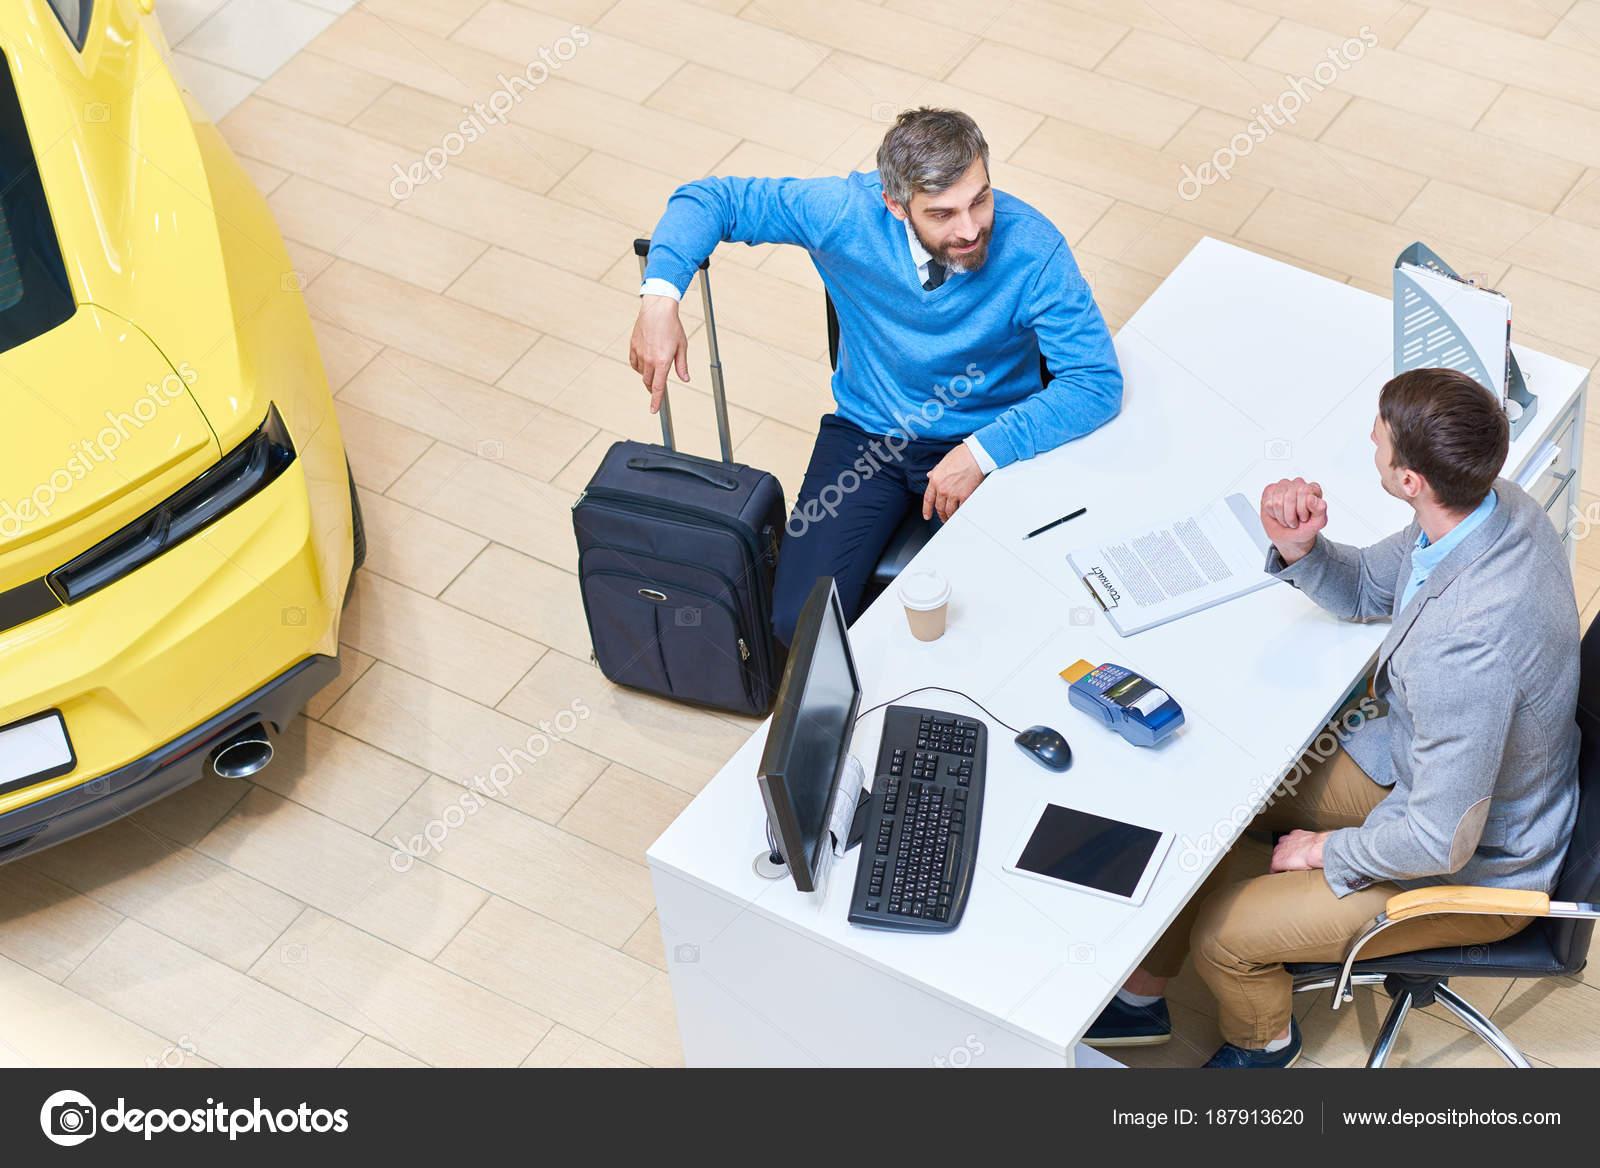 Dessus homme mature parler vendeur voiture assis bureau magasin